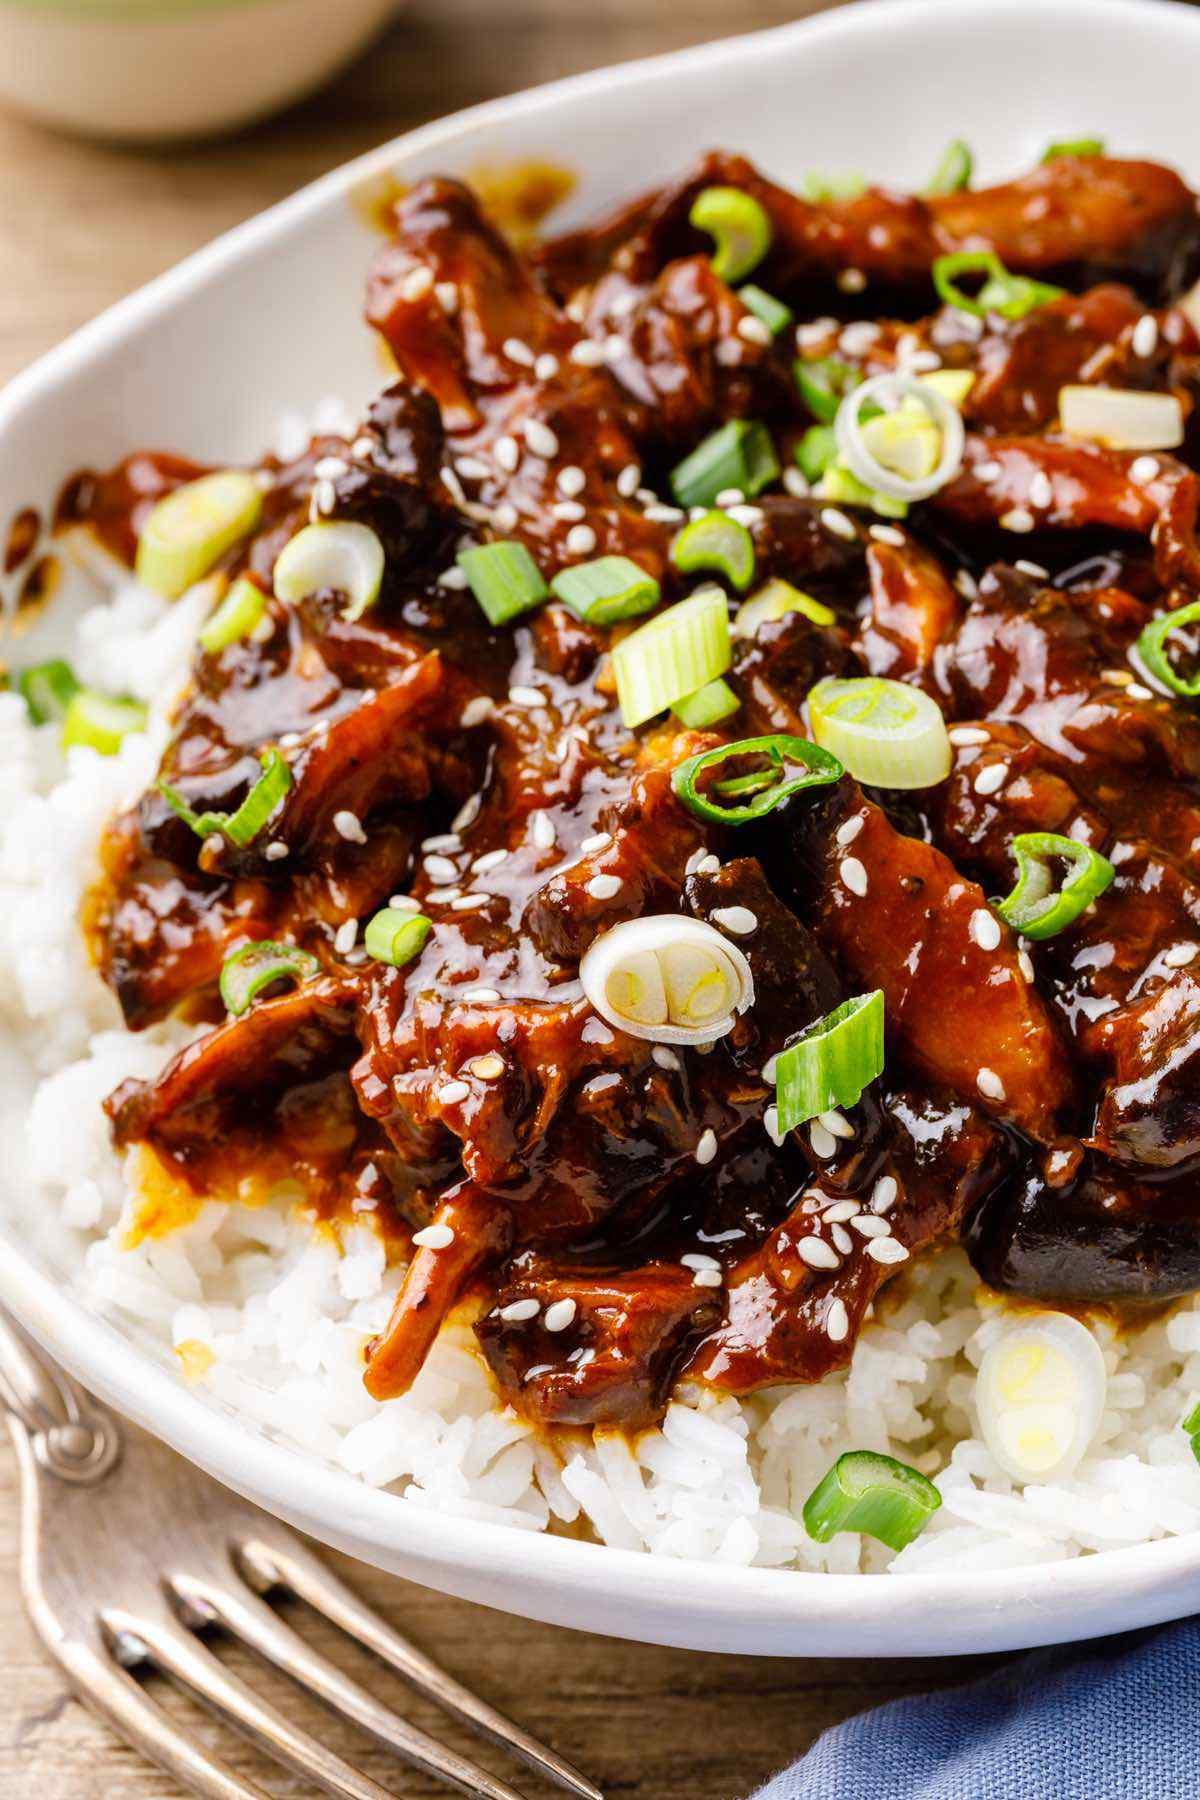 Easy Crockpot Teriyaki Chicken Thigh Recipe